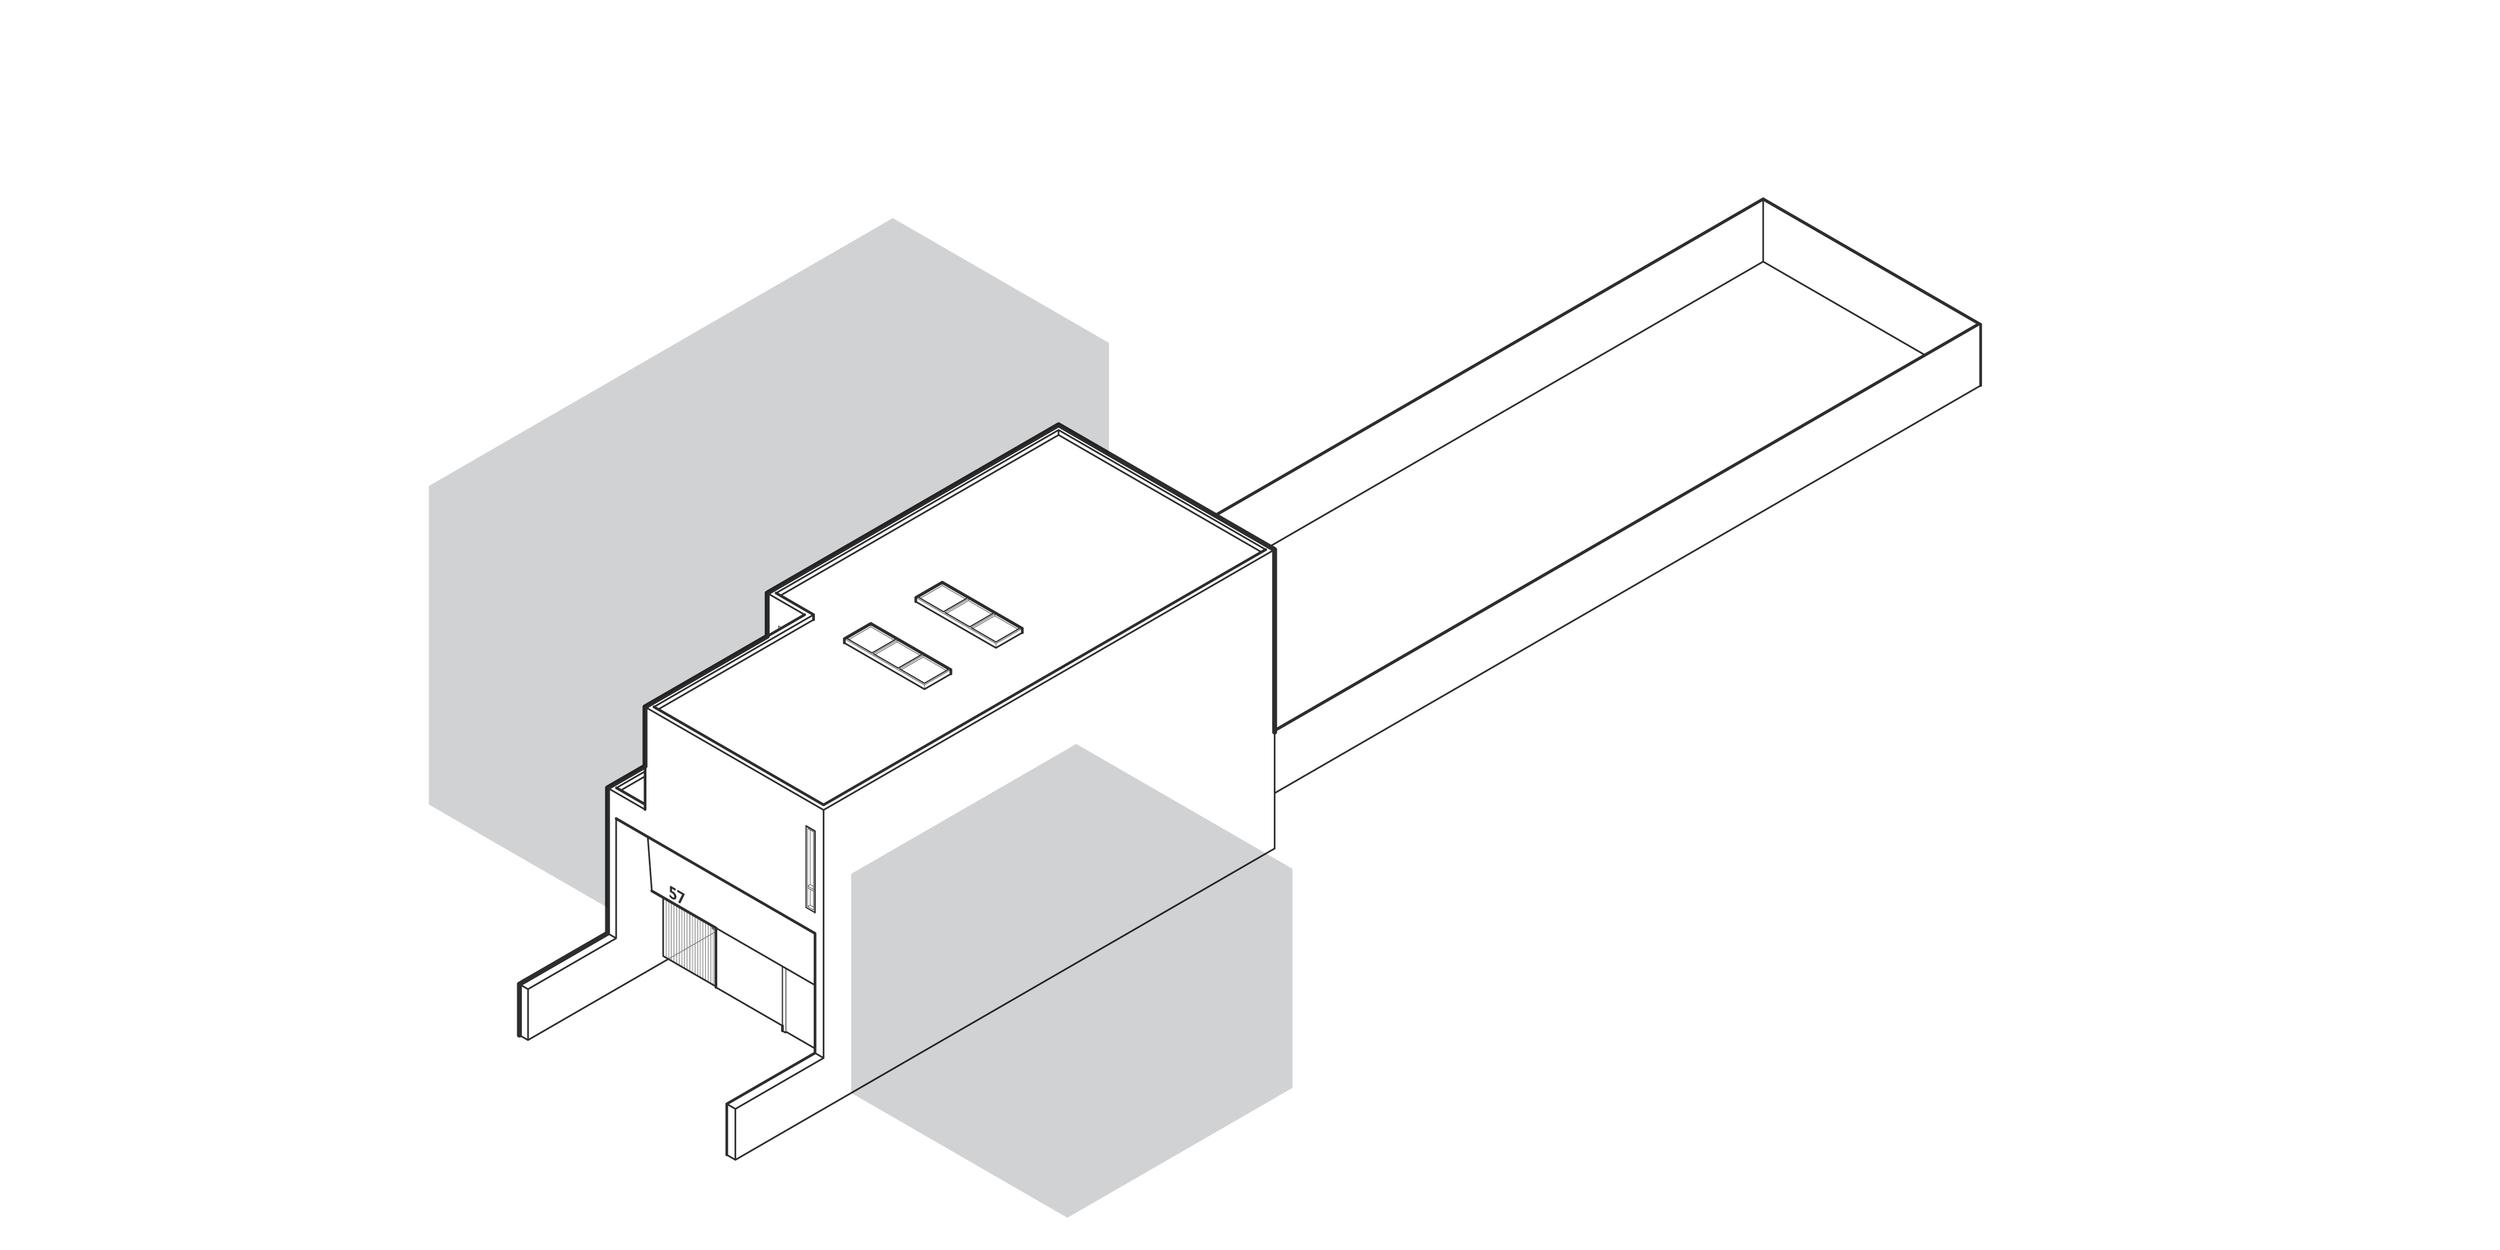 57_Highland-160413-Diagram-10-01.jpg